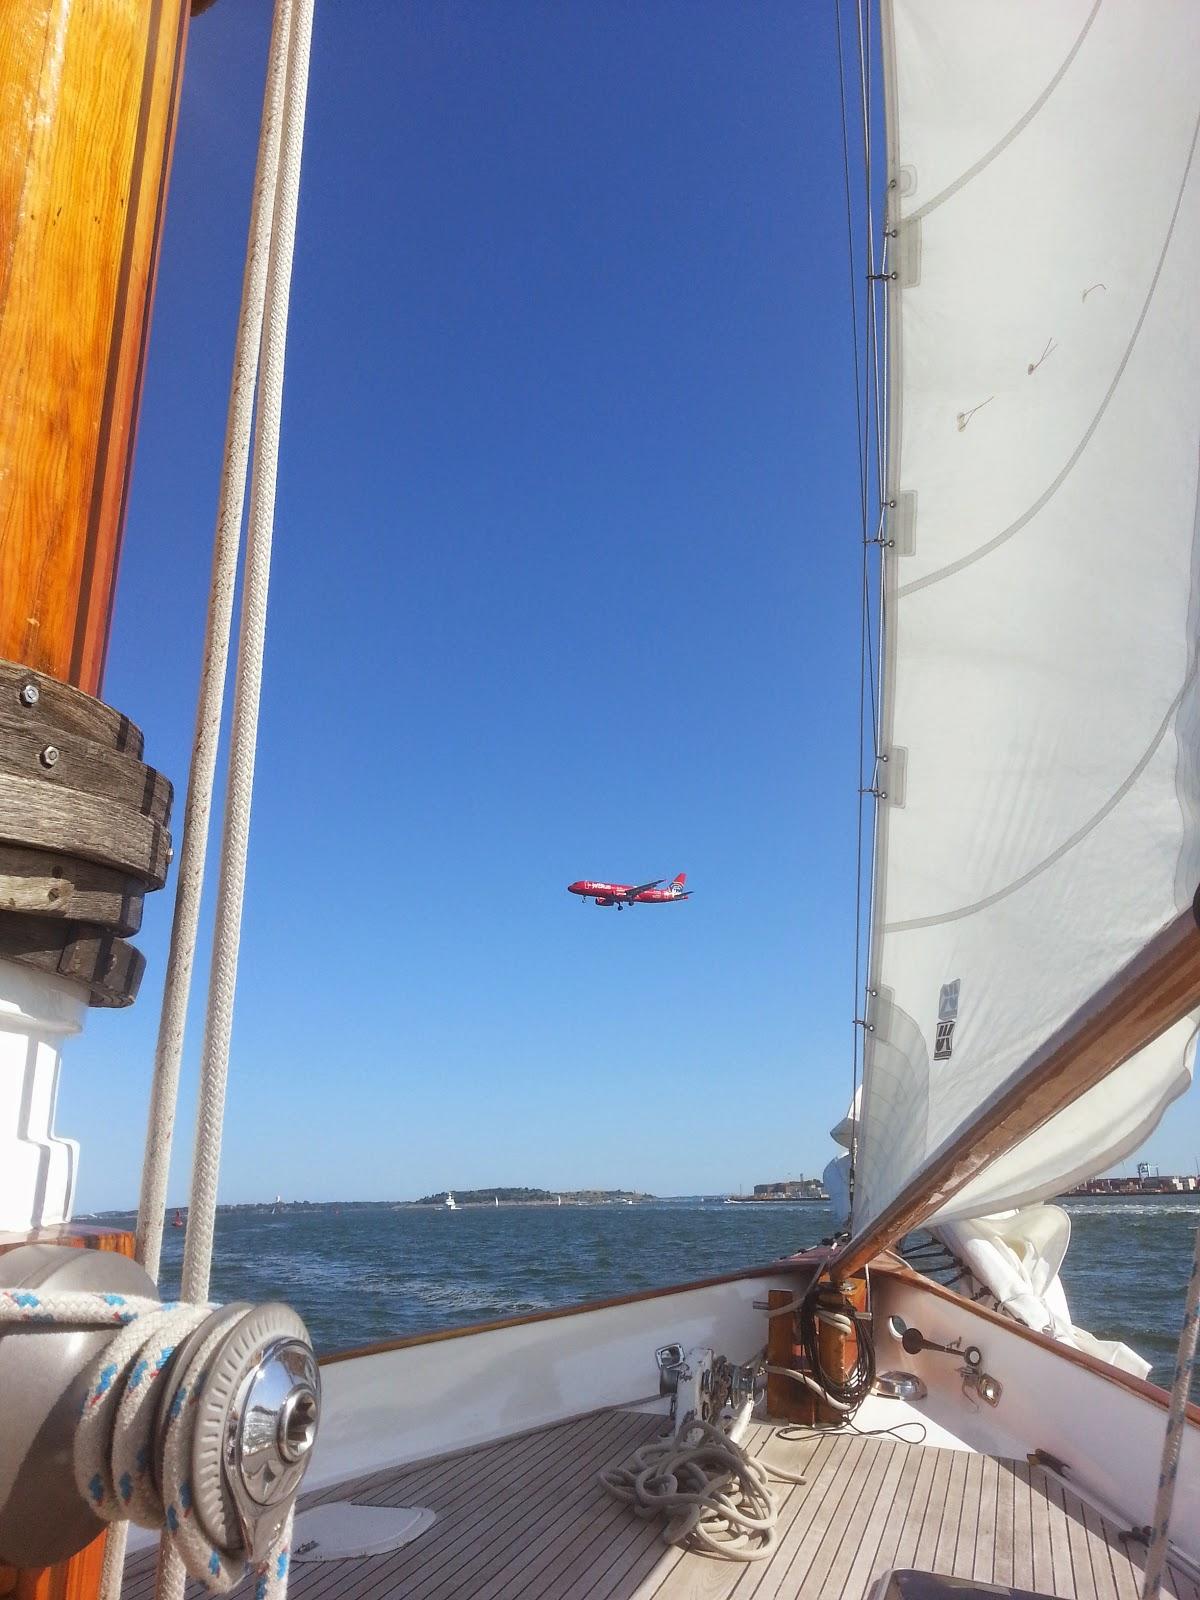 Sailing through the Logan flight path